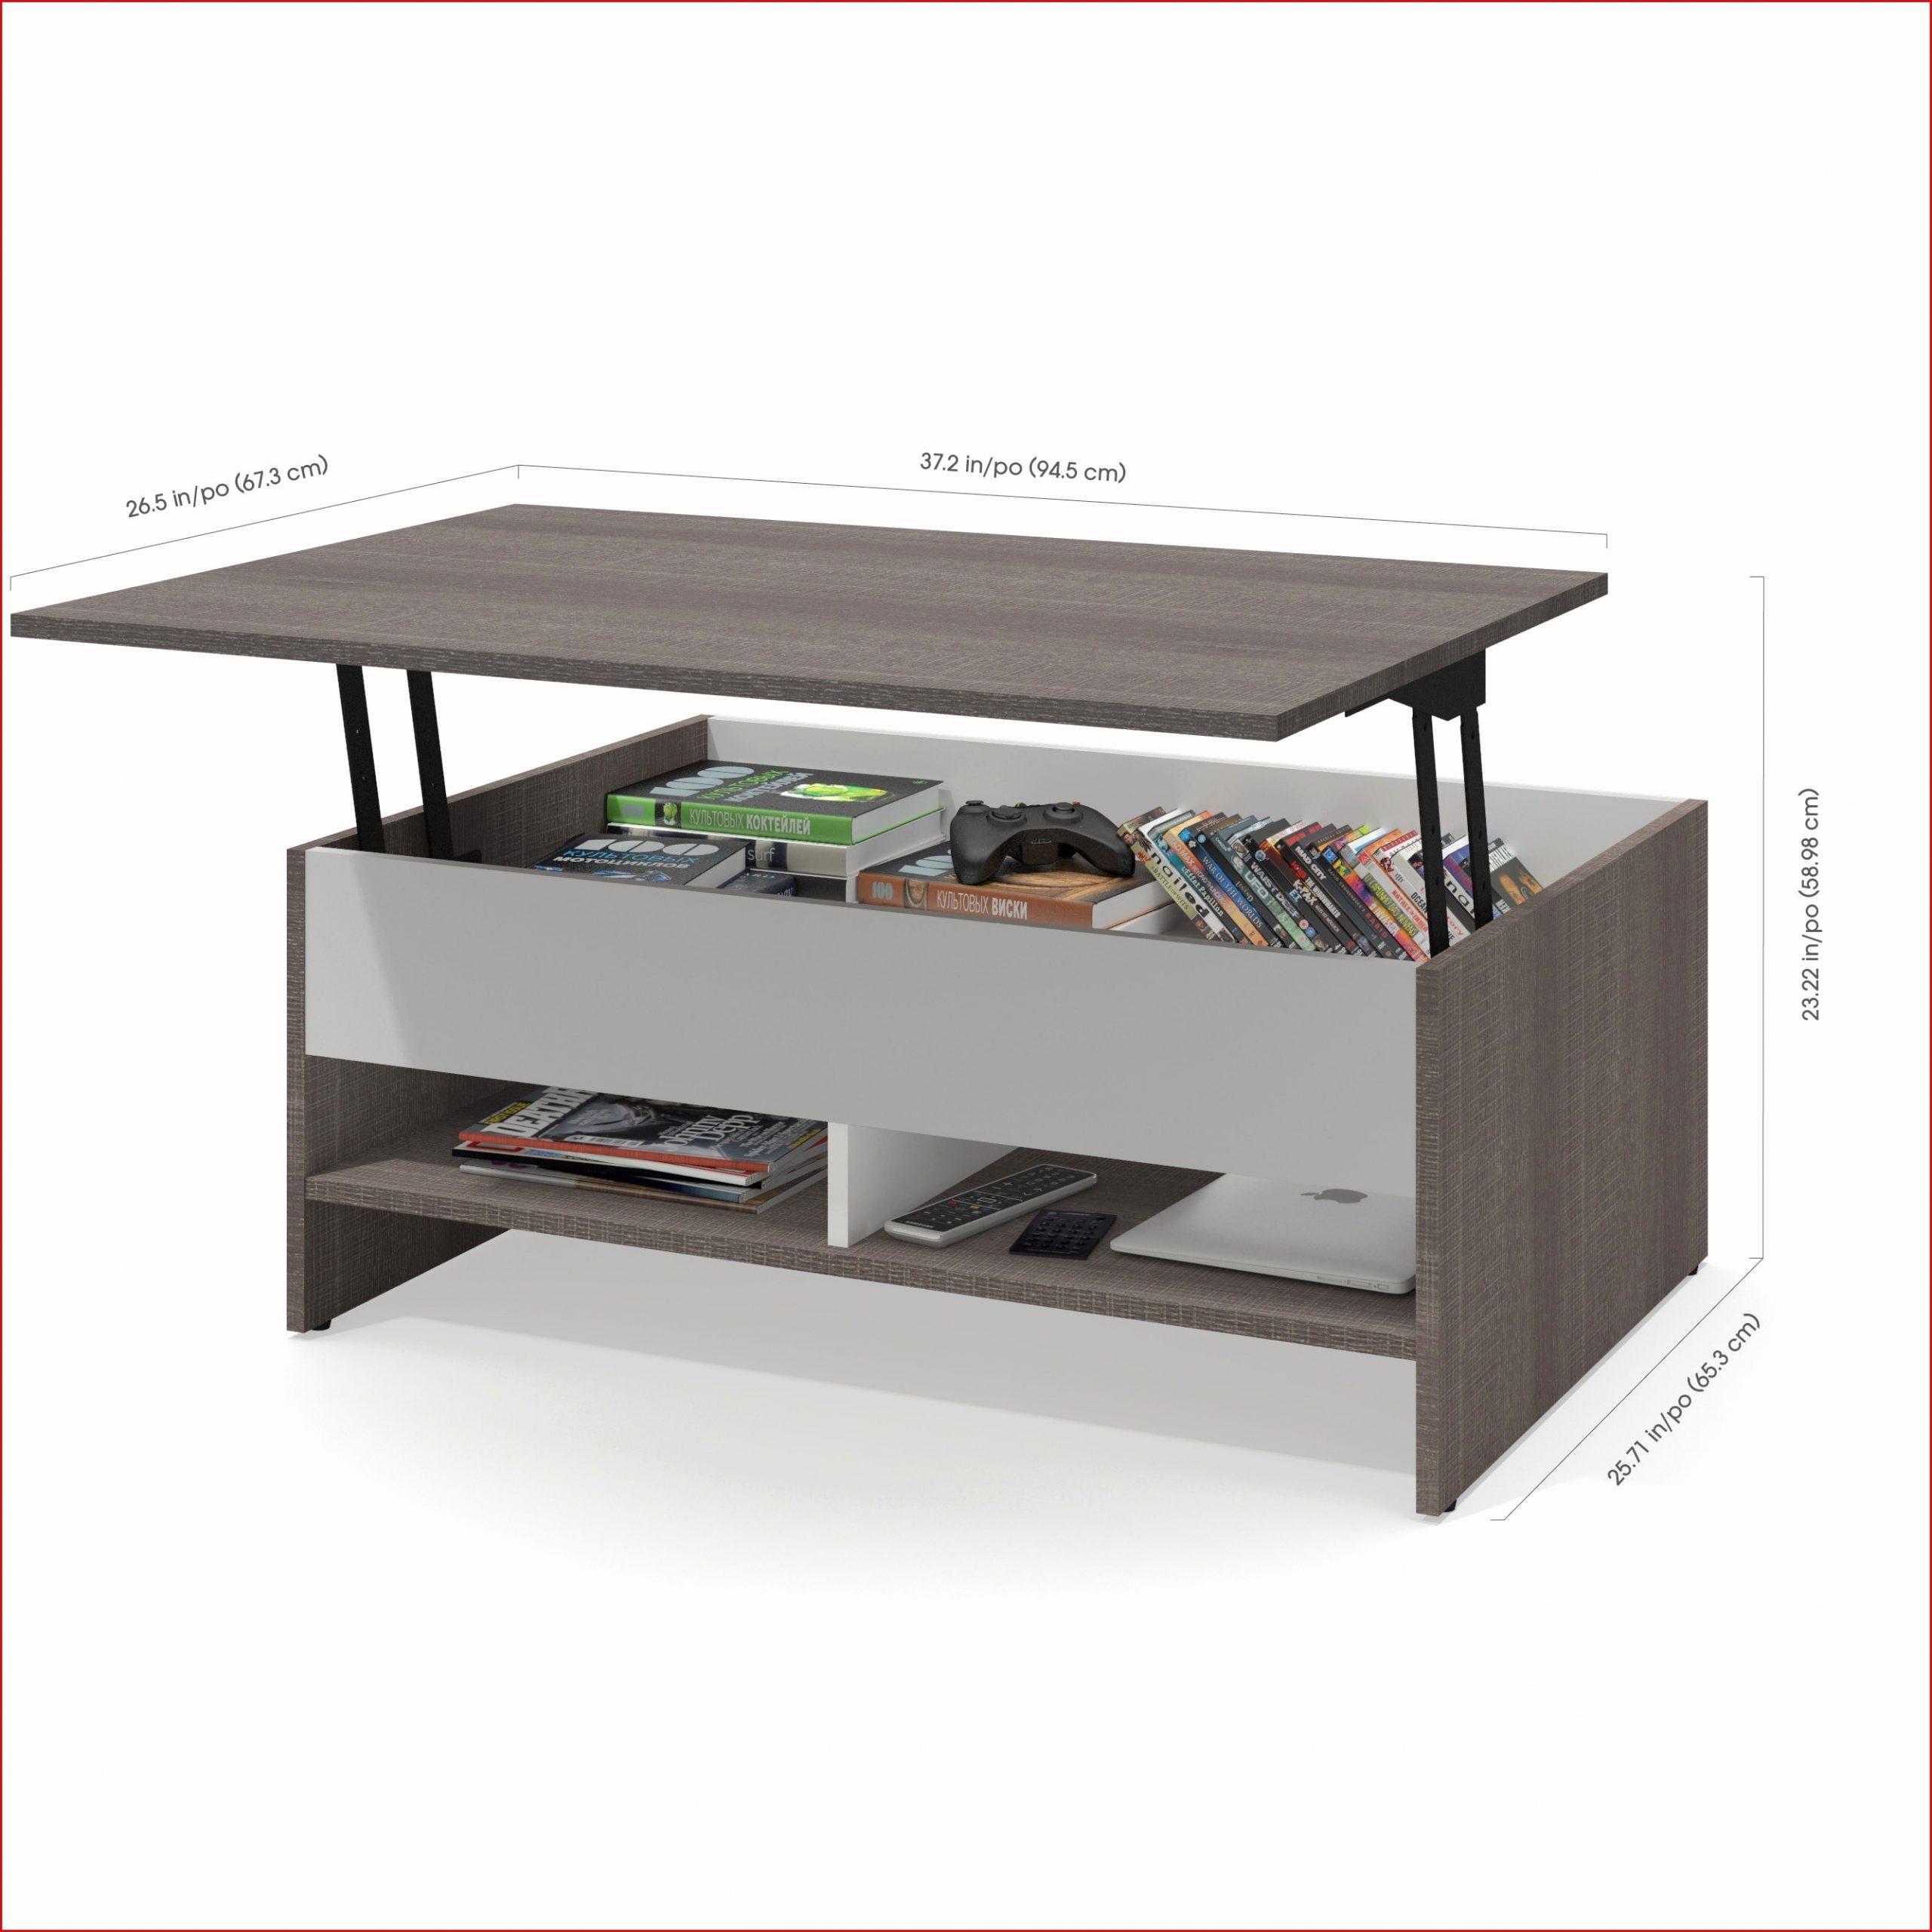 Table Industrielle Ikea Beau Table Bureau Ikea Luxe Table De ... avec Table Basse De Jardin Ikea